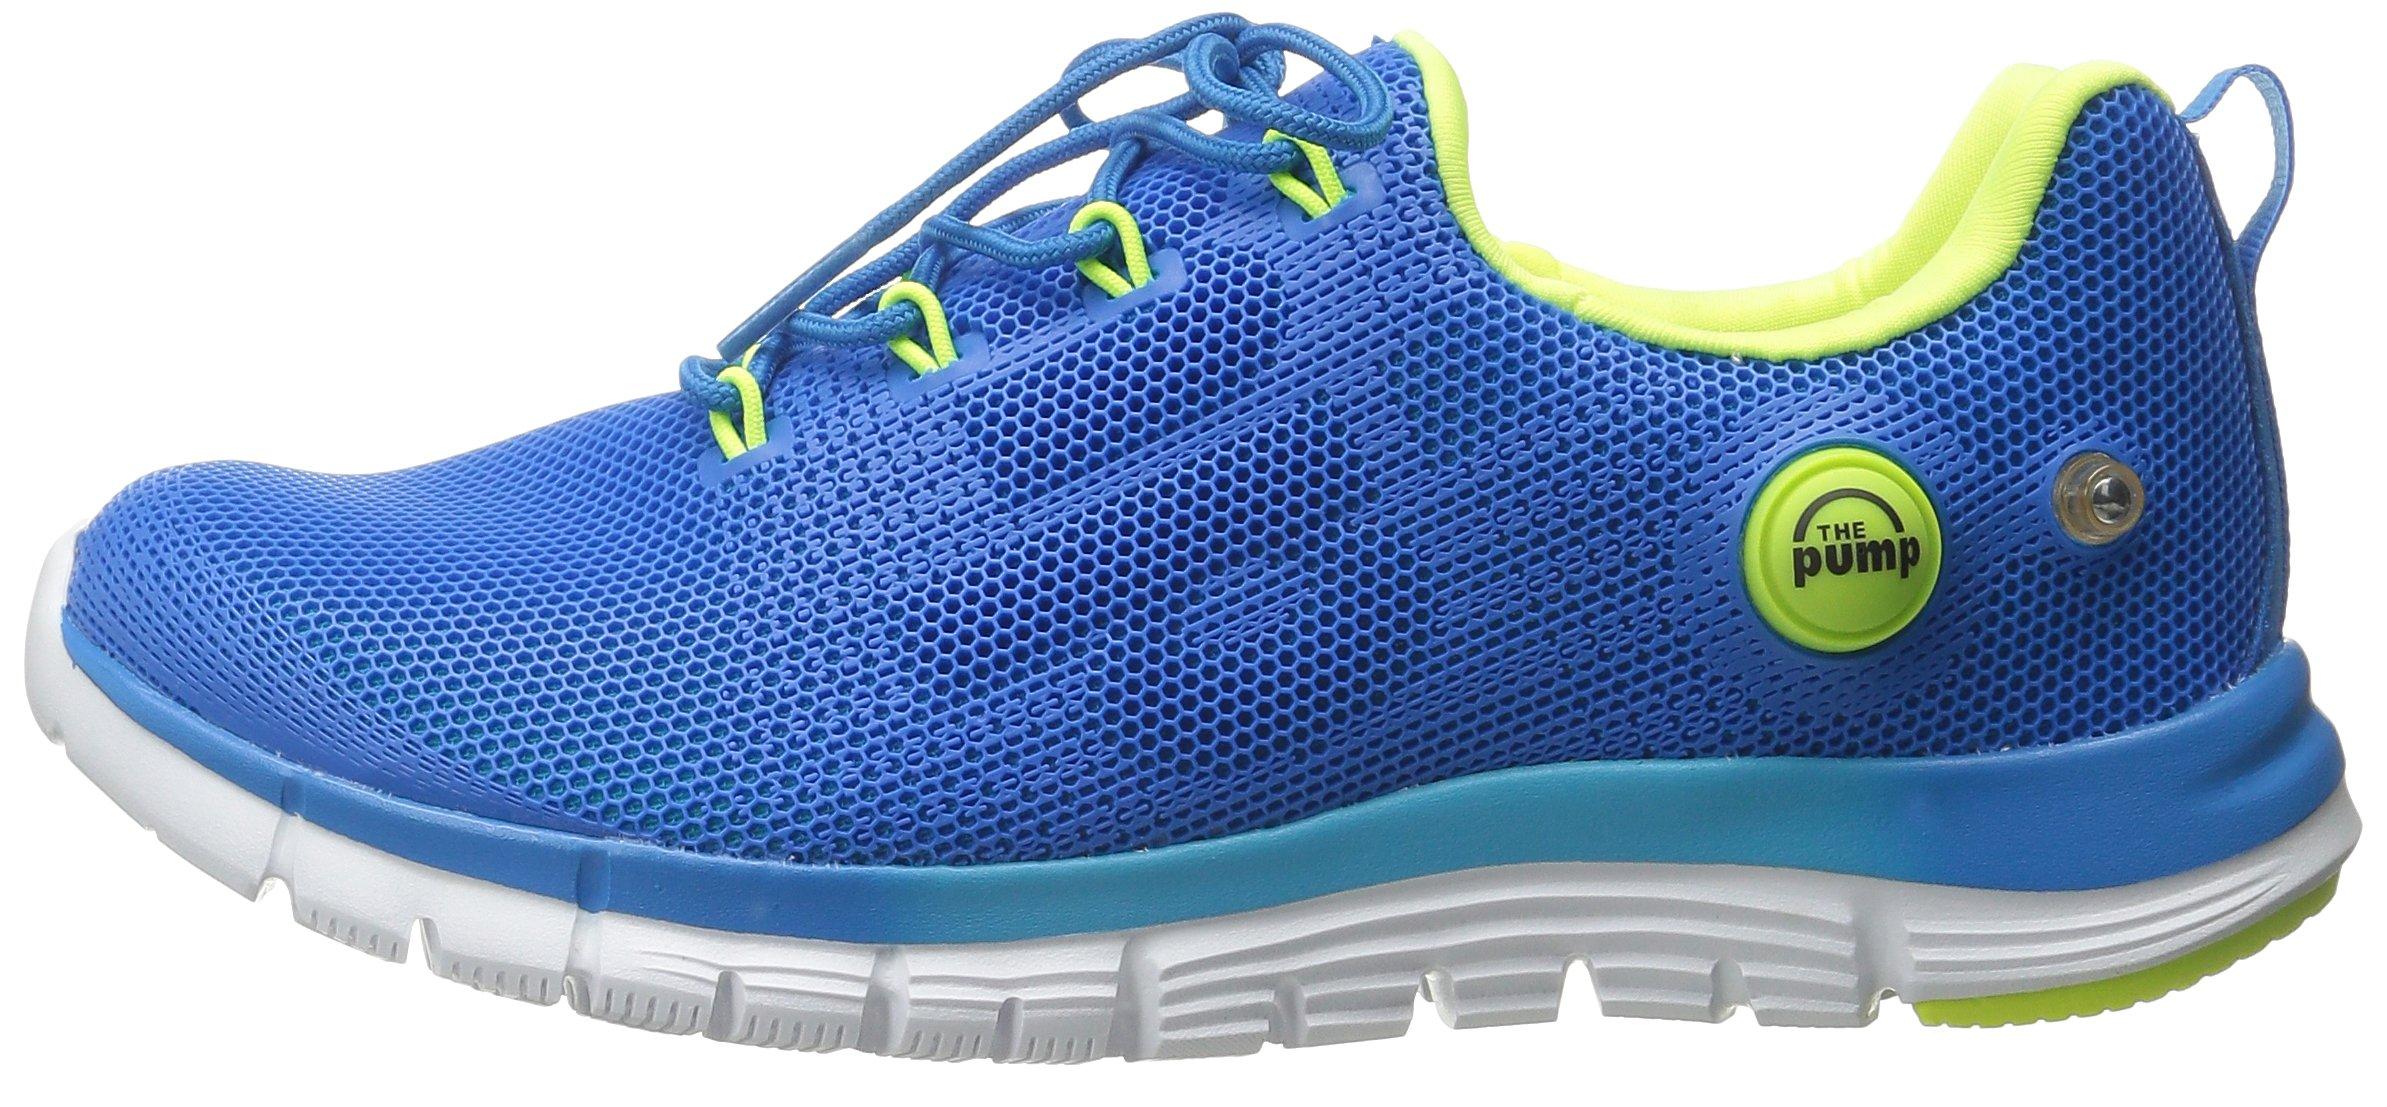 81wmLNqImeL - Reebok Women's Z Pump Fusion Polyurethane Running Shoe